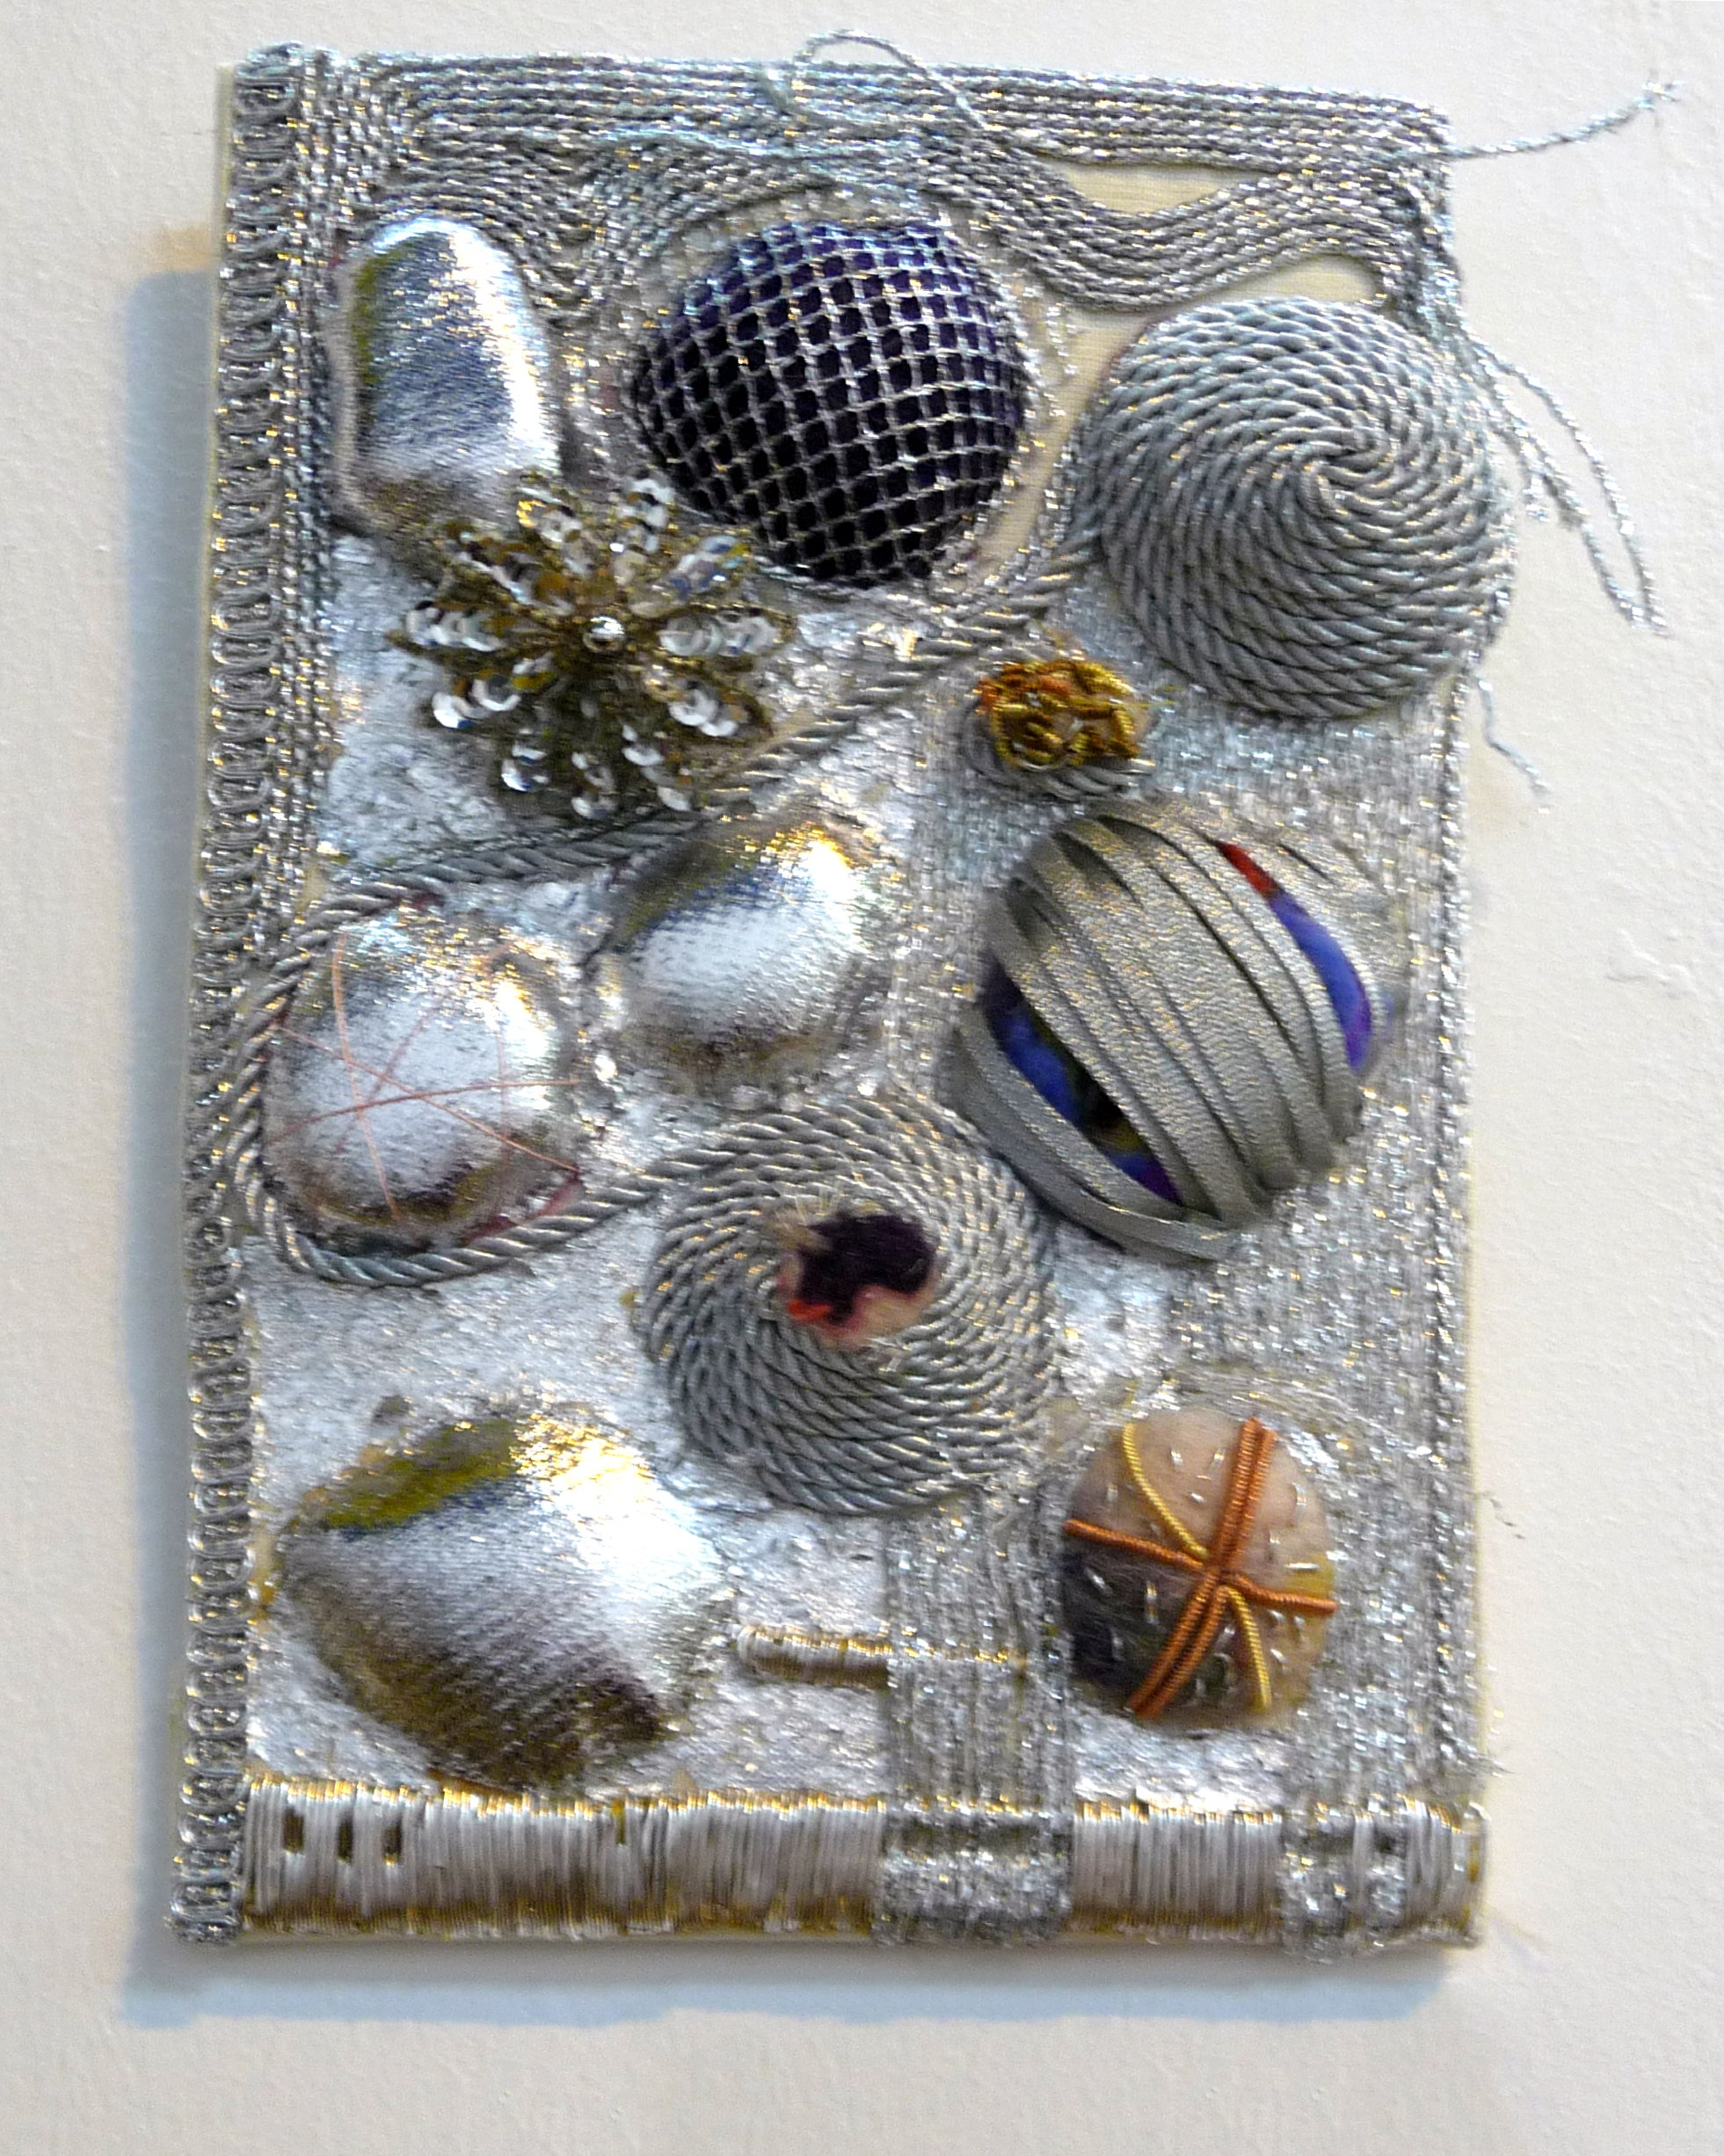 EG All That Glistens 2015 entry RAISED VALVE by Lesley Illingworth